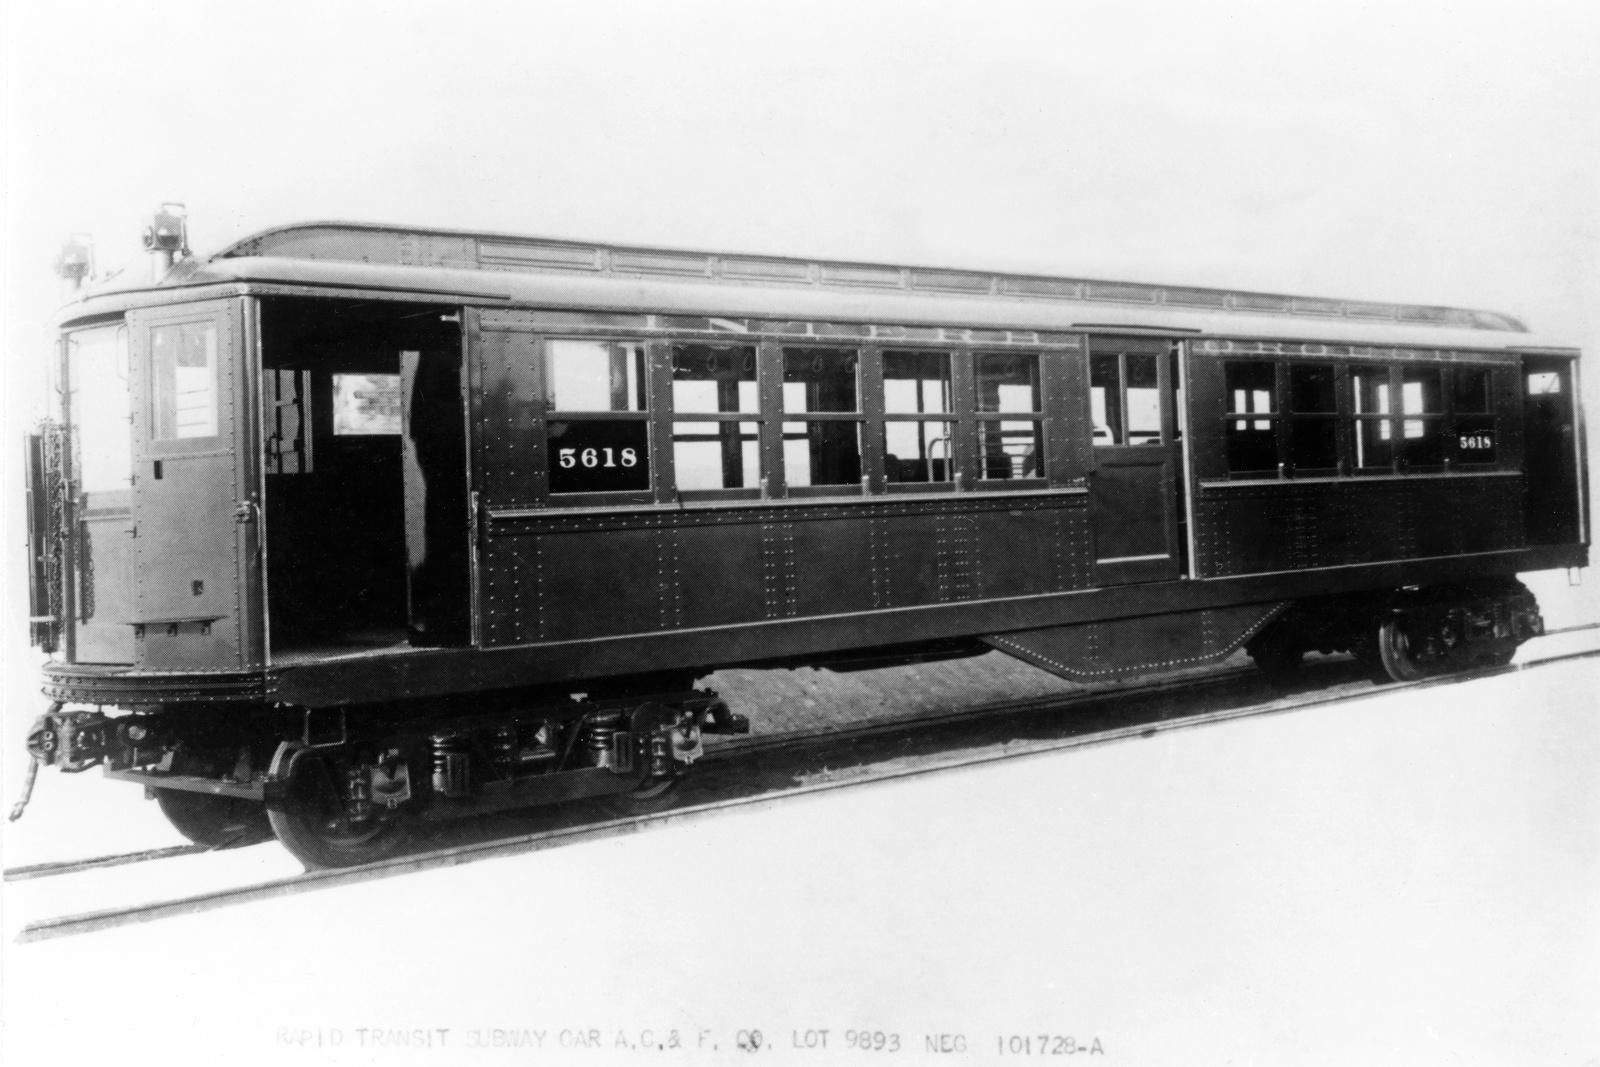 (113k, 800x399)<br><b>Country:</b> United States<br><b>City:</b> New York<br><b>System:</b> New York City Transit<br><b>Car:</b> Low-V 5618 <br><b>Collection of:</b> Nate Gerstein/Ed Davis Sr.<br><b>Viewed (this week/total):</b> 0 / 1653